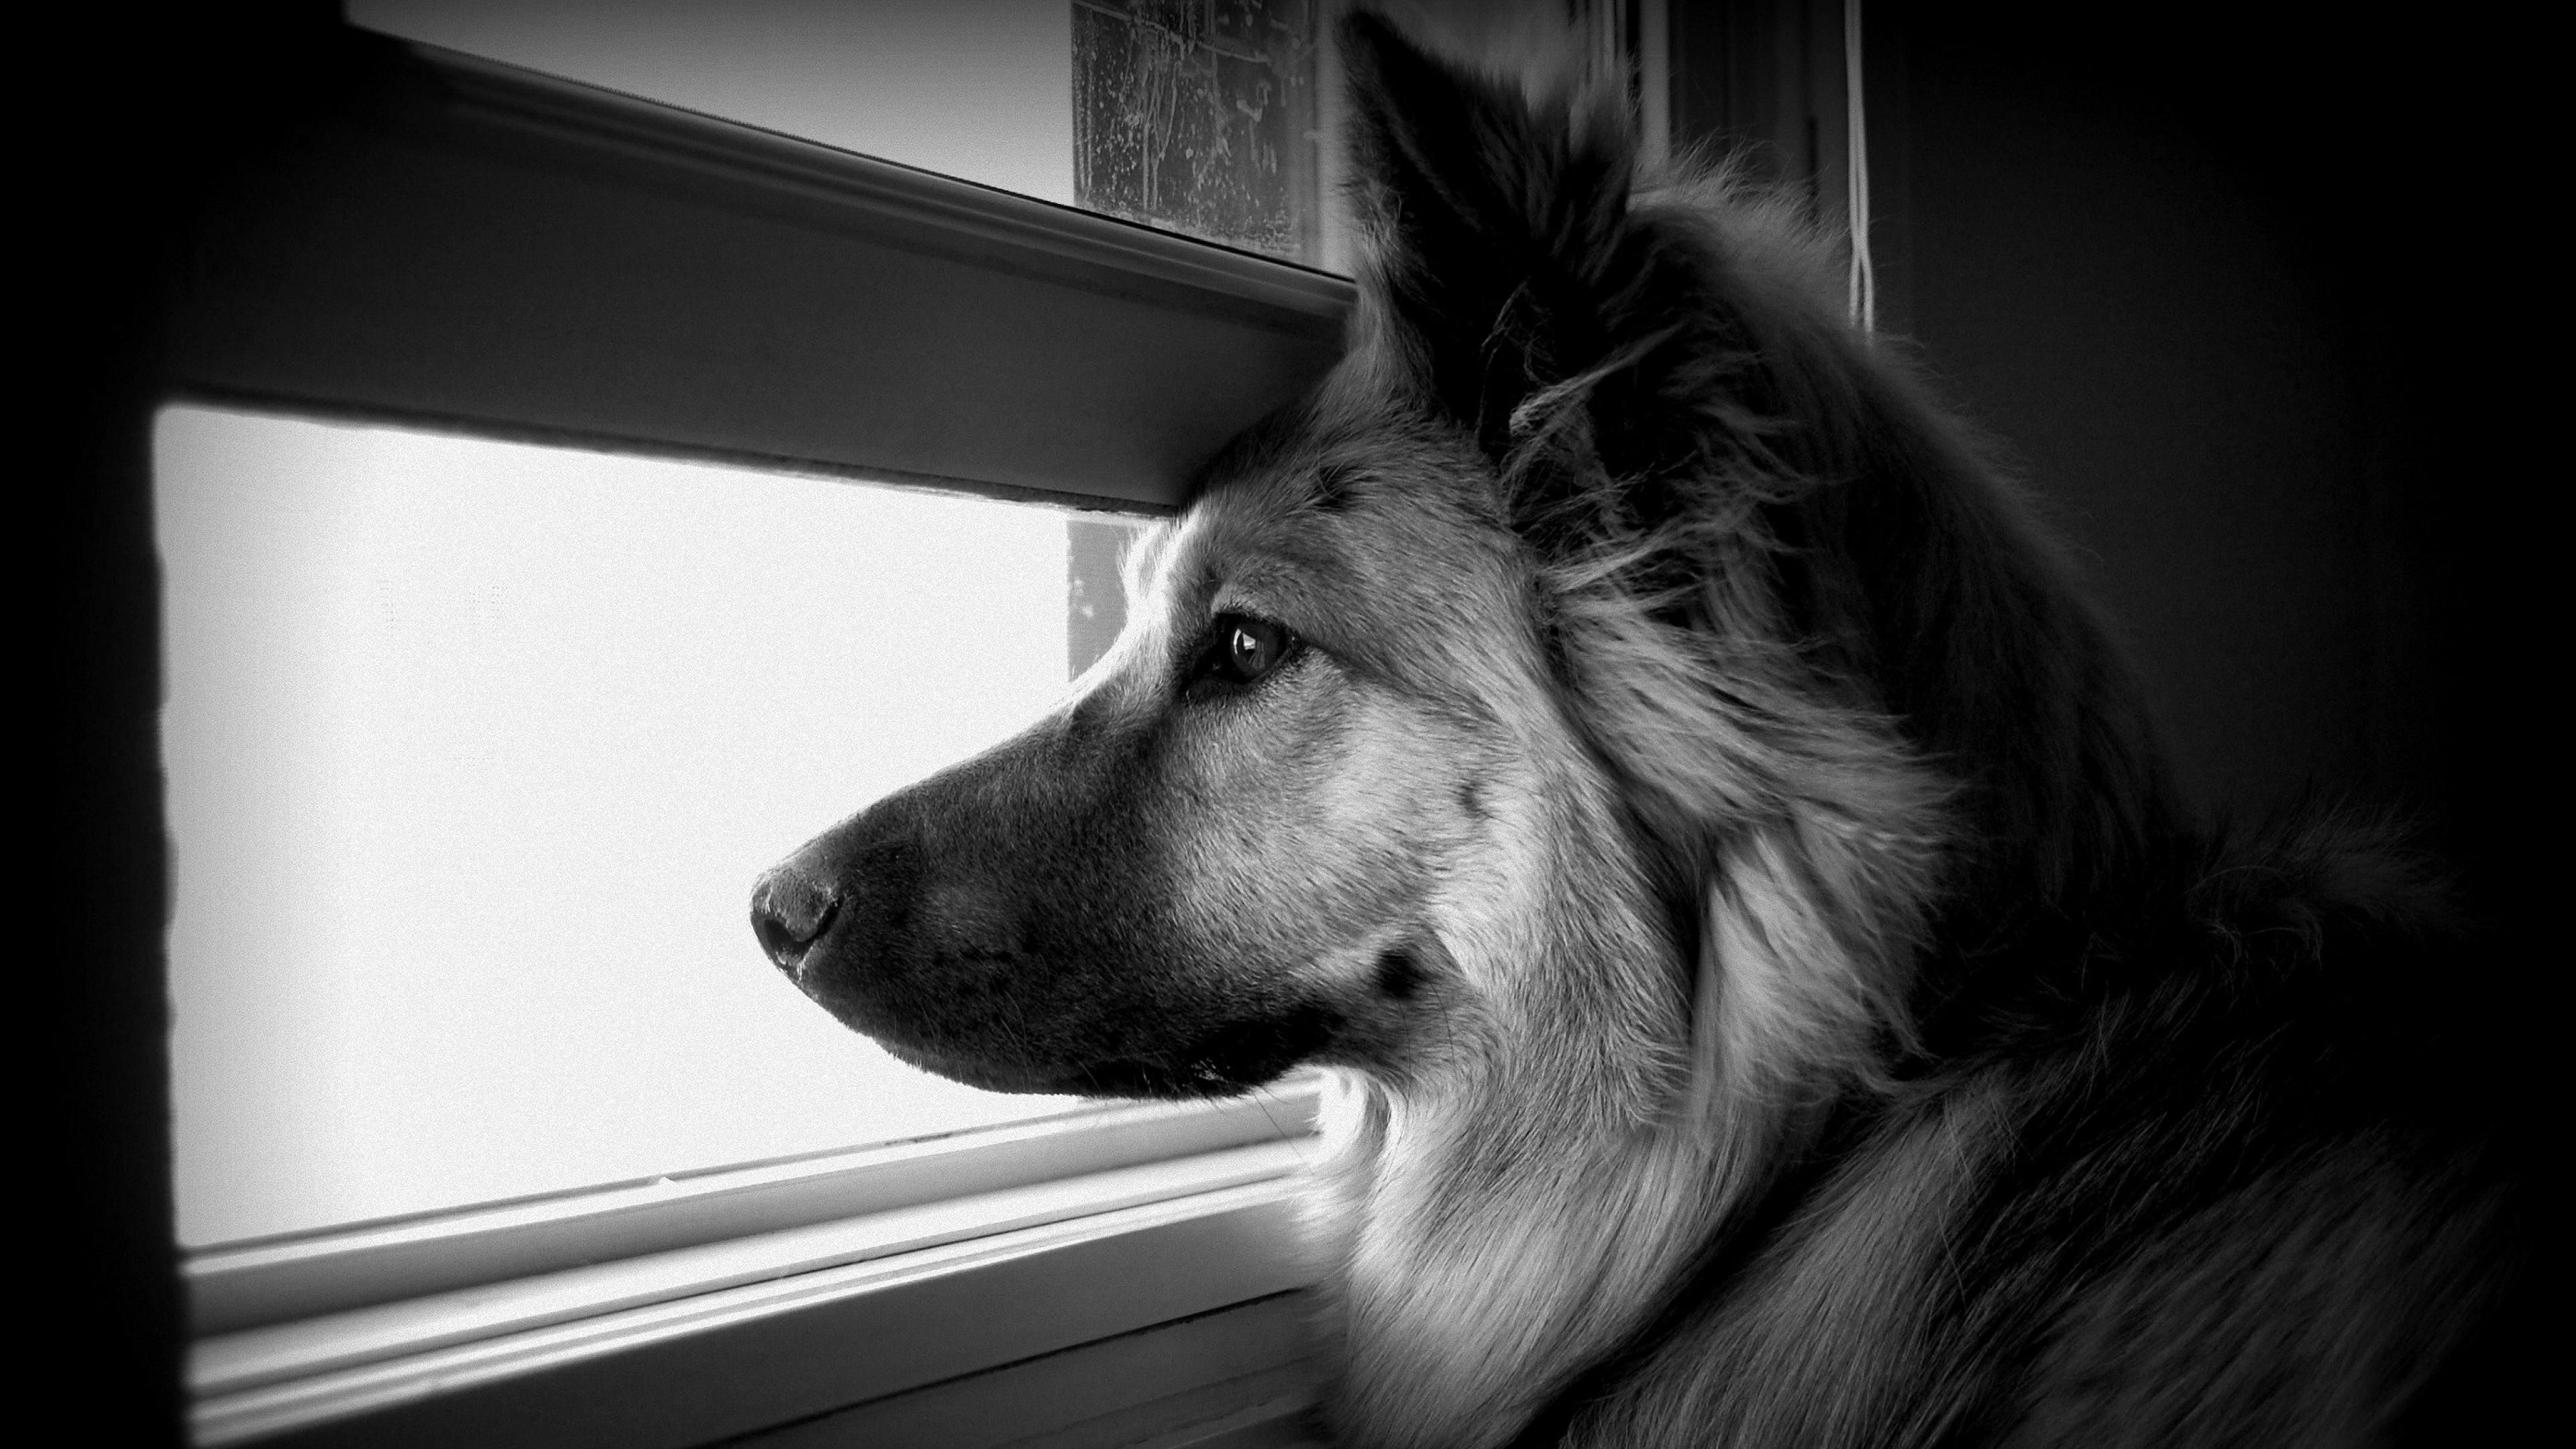 Black And White Dog Wallpaper 1080p ~ Sdeerwallpaper